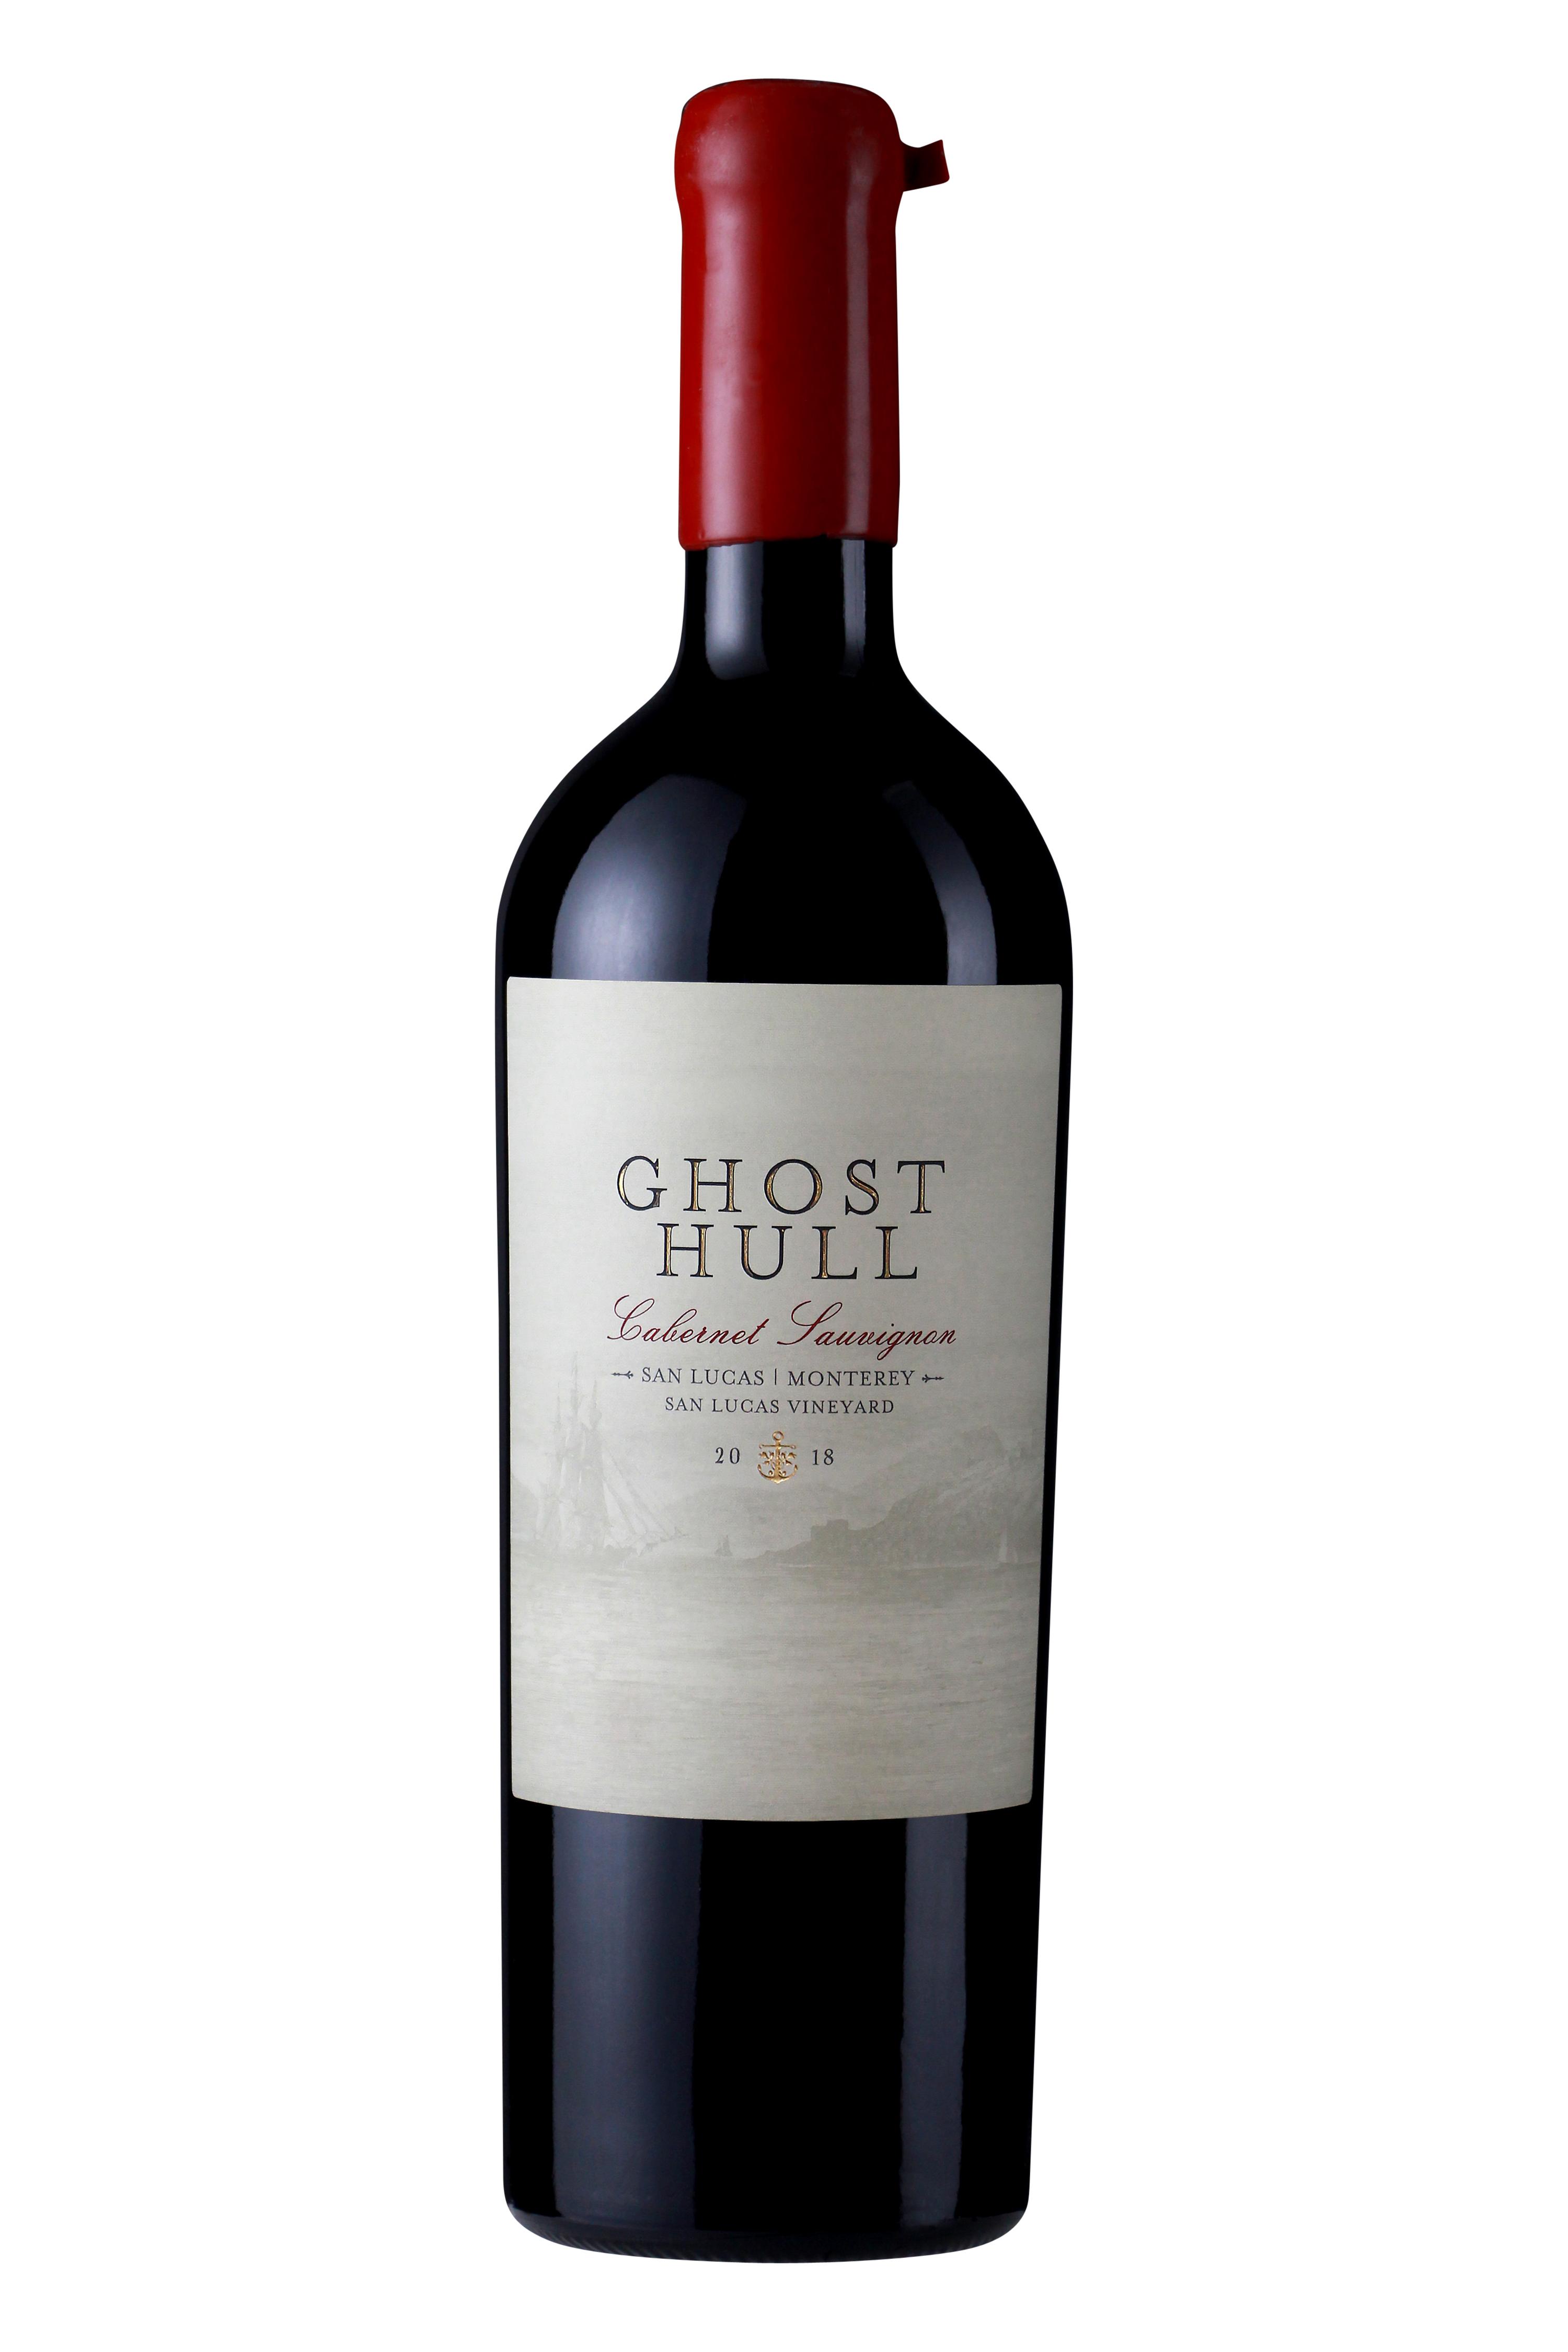 Ghost Hull 2018 Cabernet Sauvignon Bottle Shot